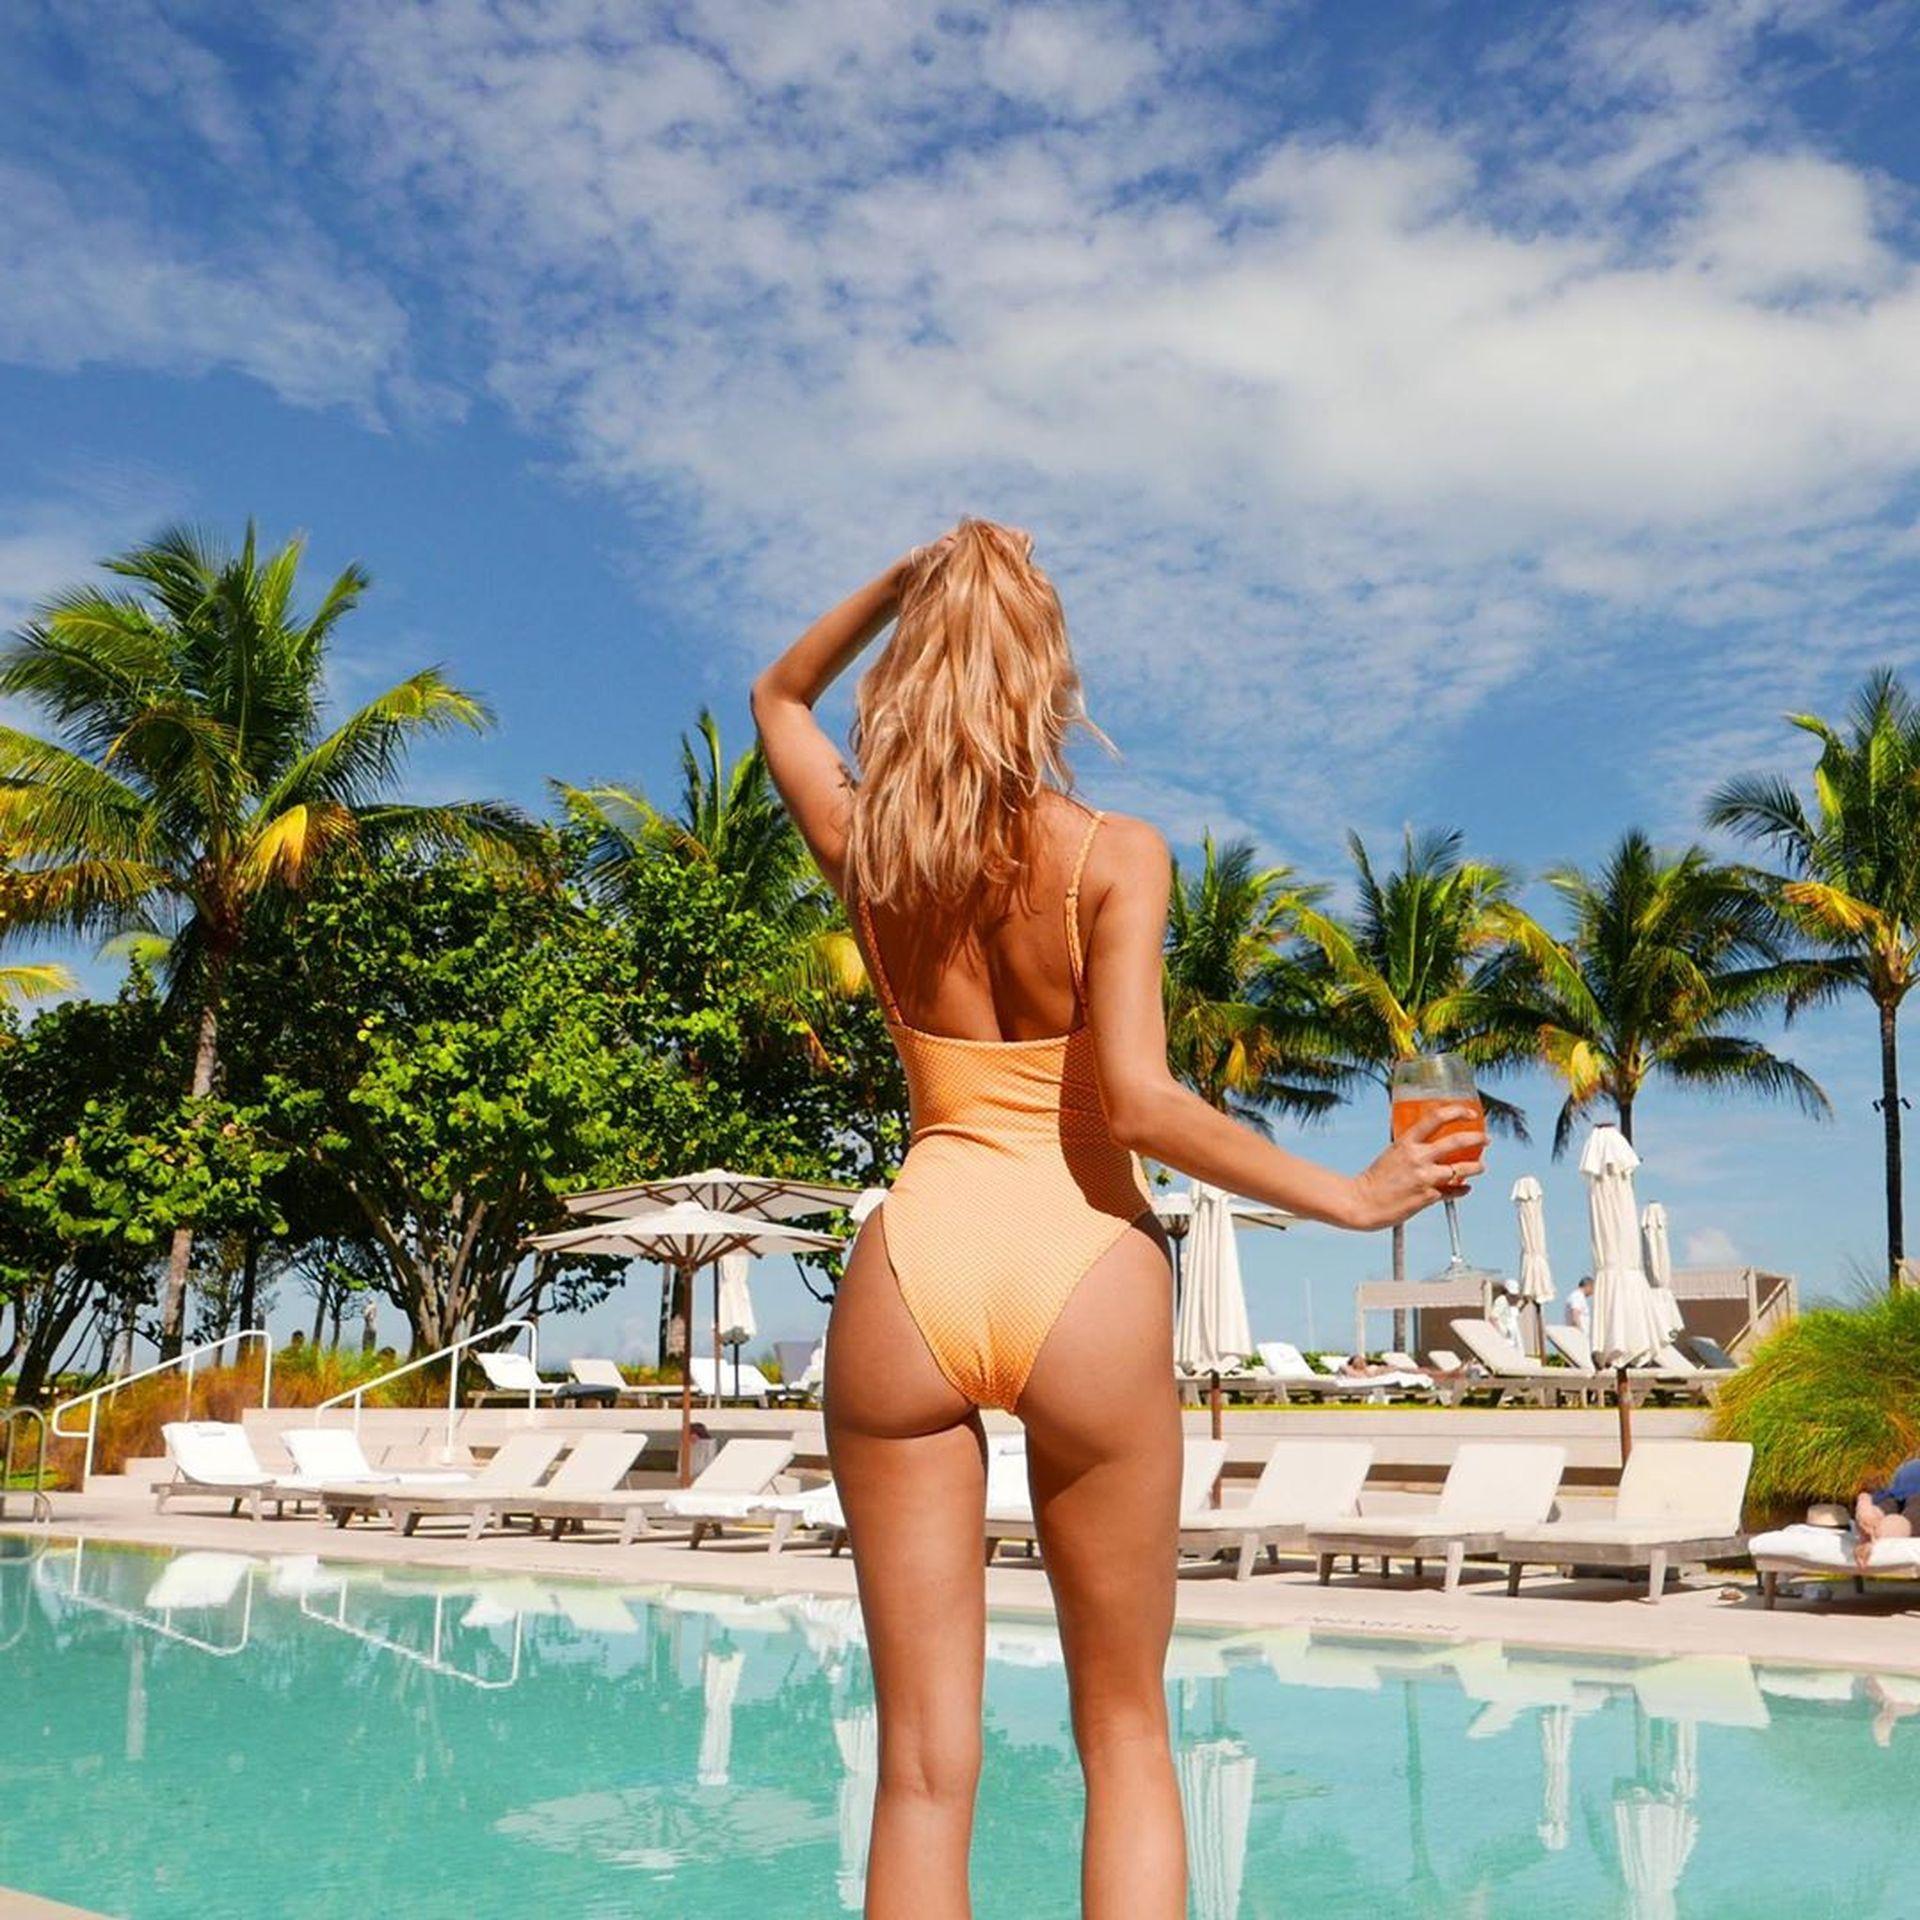 Kimberley Garner Seen Wearing An Orange Swimsuit In Miami 0030